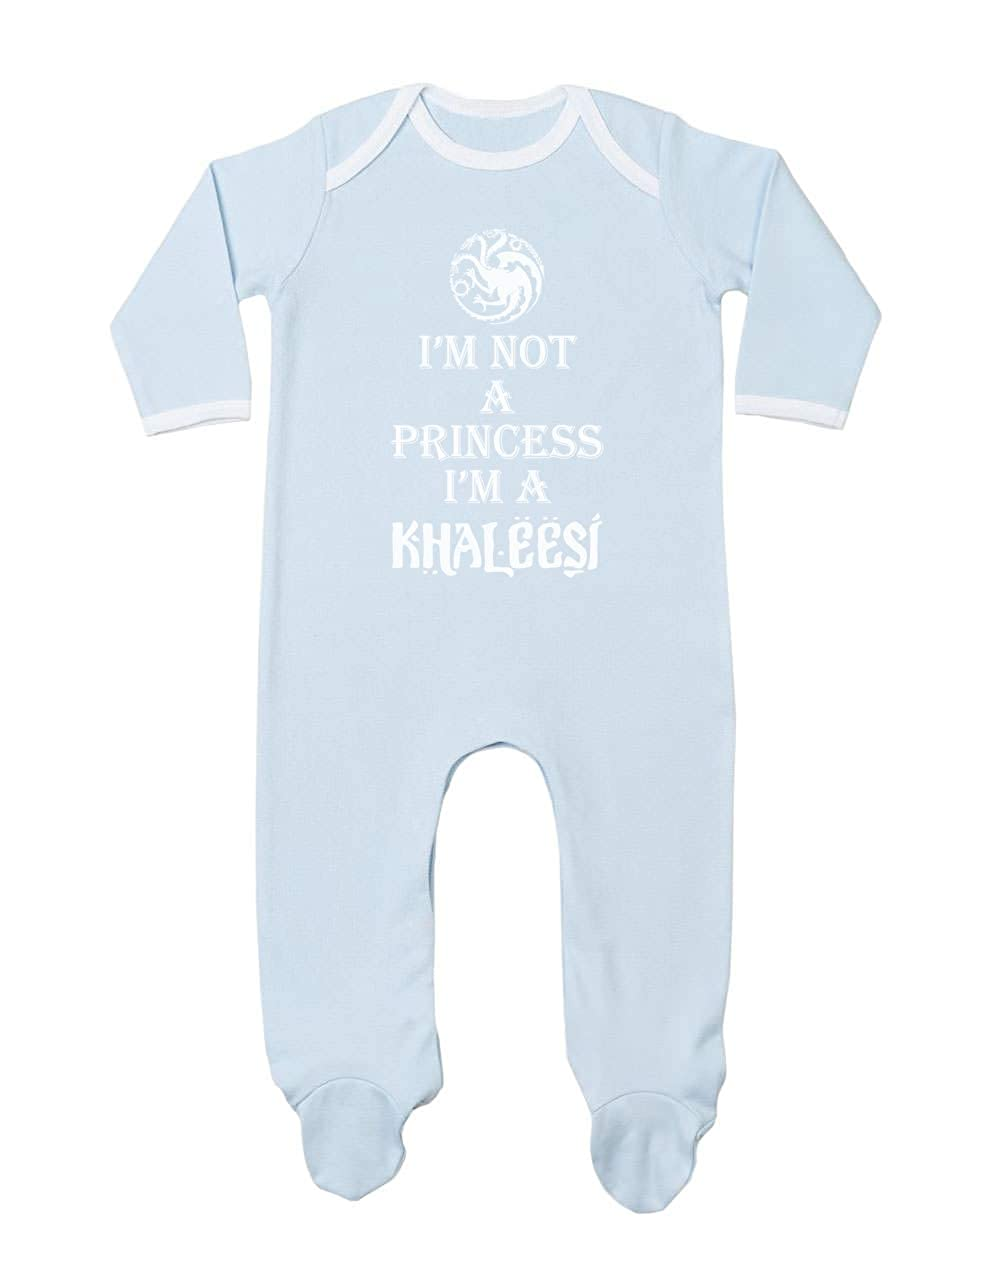 Mono Enterizo bebé - I'm Not A Princess I'm A Khaleesi - Idea de Regalo para Niña Recién Nacida a139096dg_ies